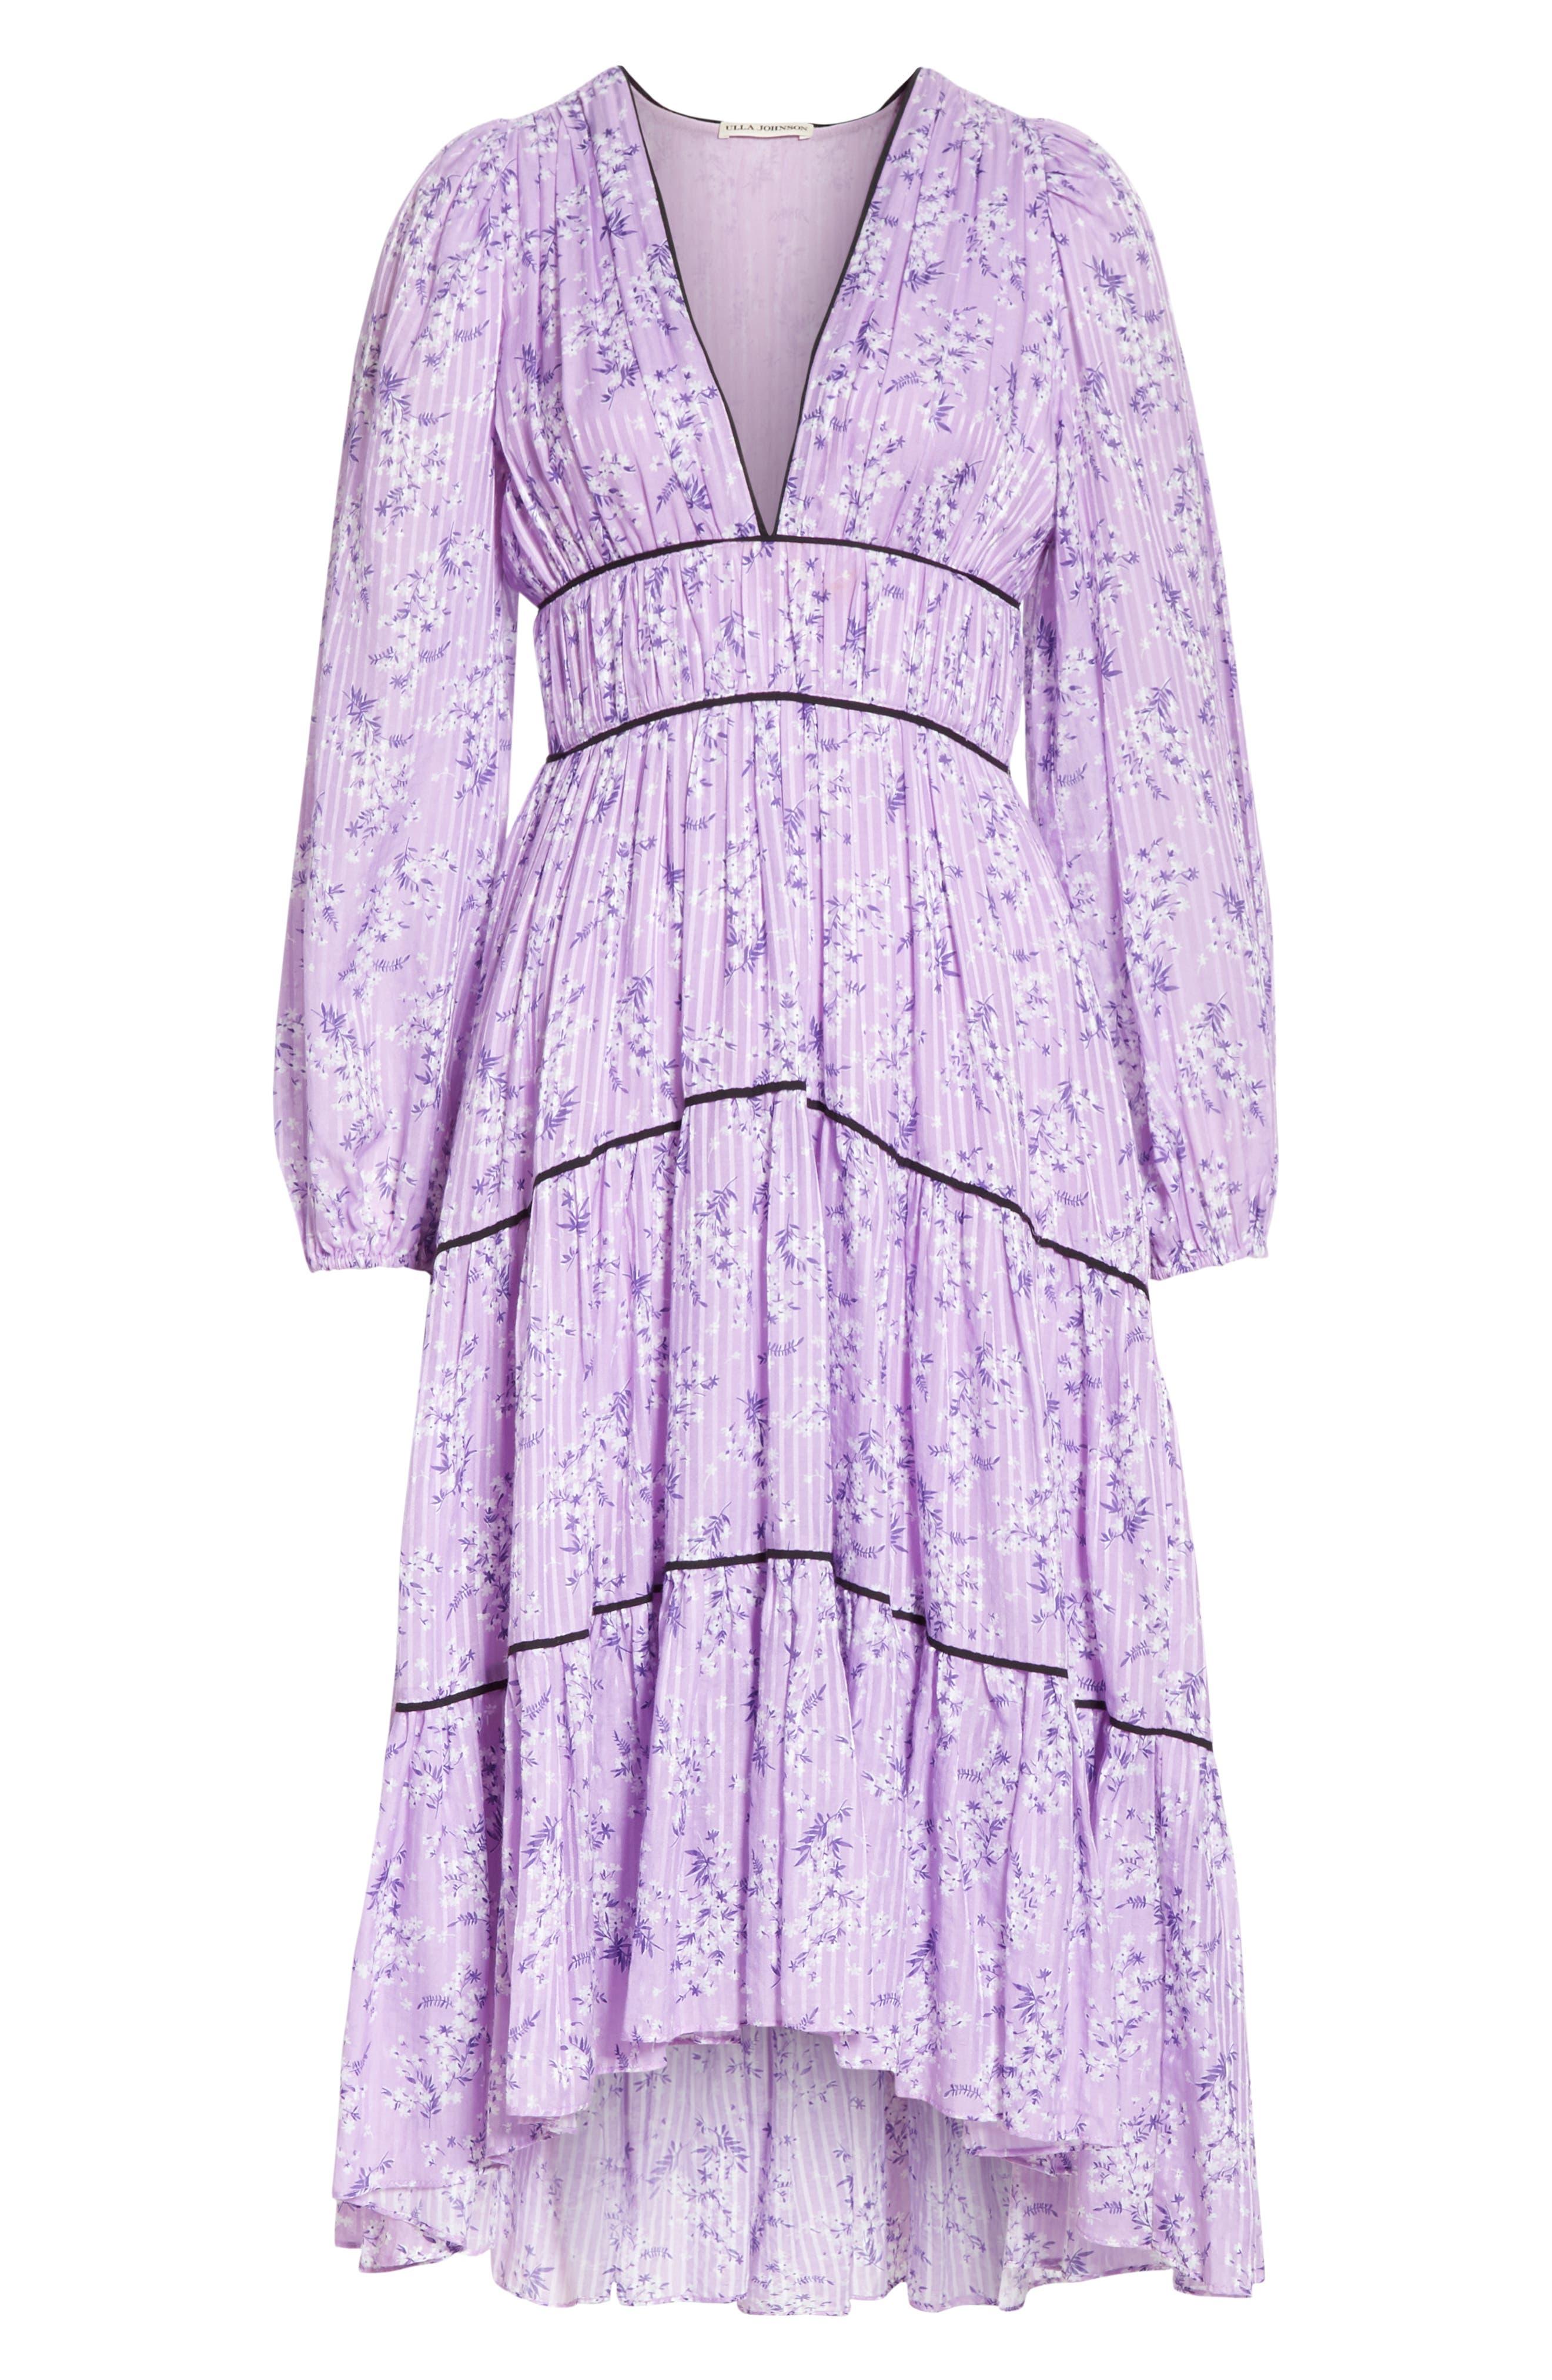 Joan Floral Print Cotton & Silk Midi Dress,                             Alternate thumbnail 6, color,                             LILAC